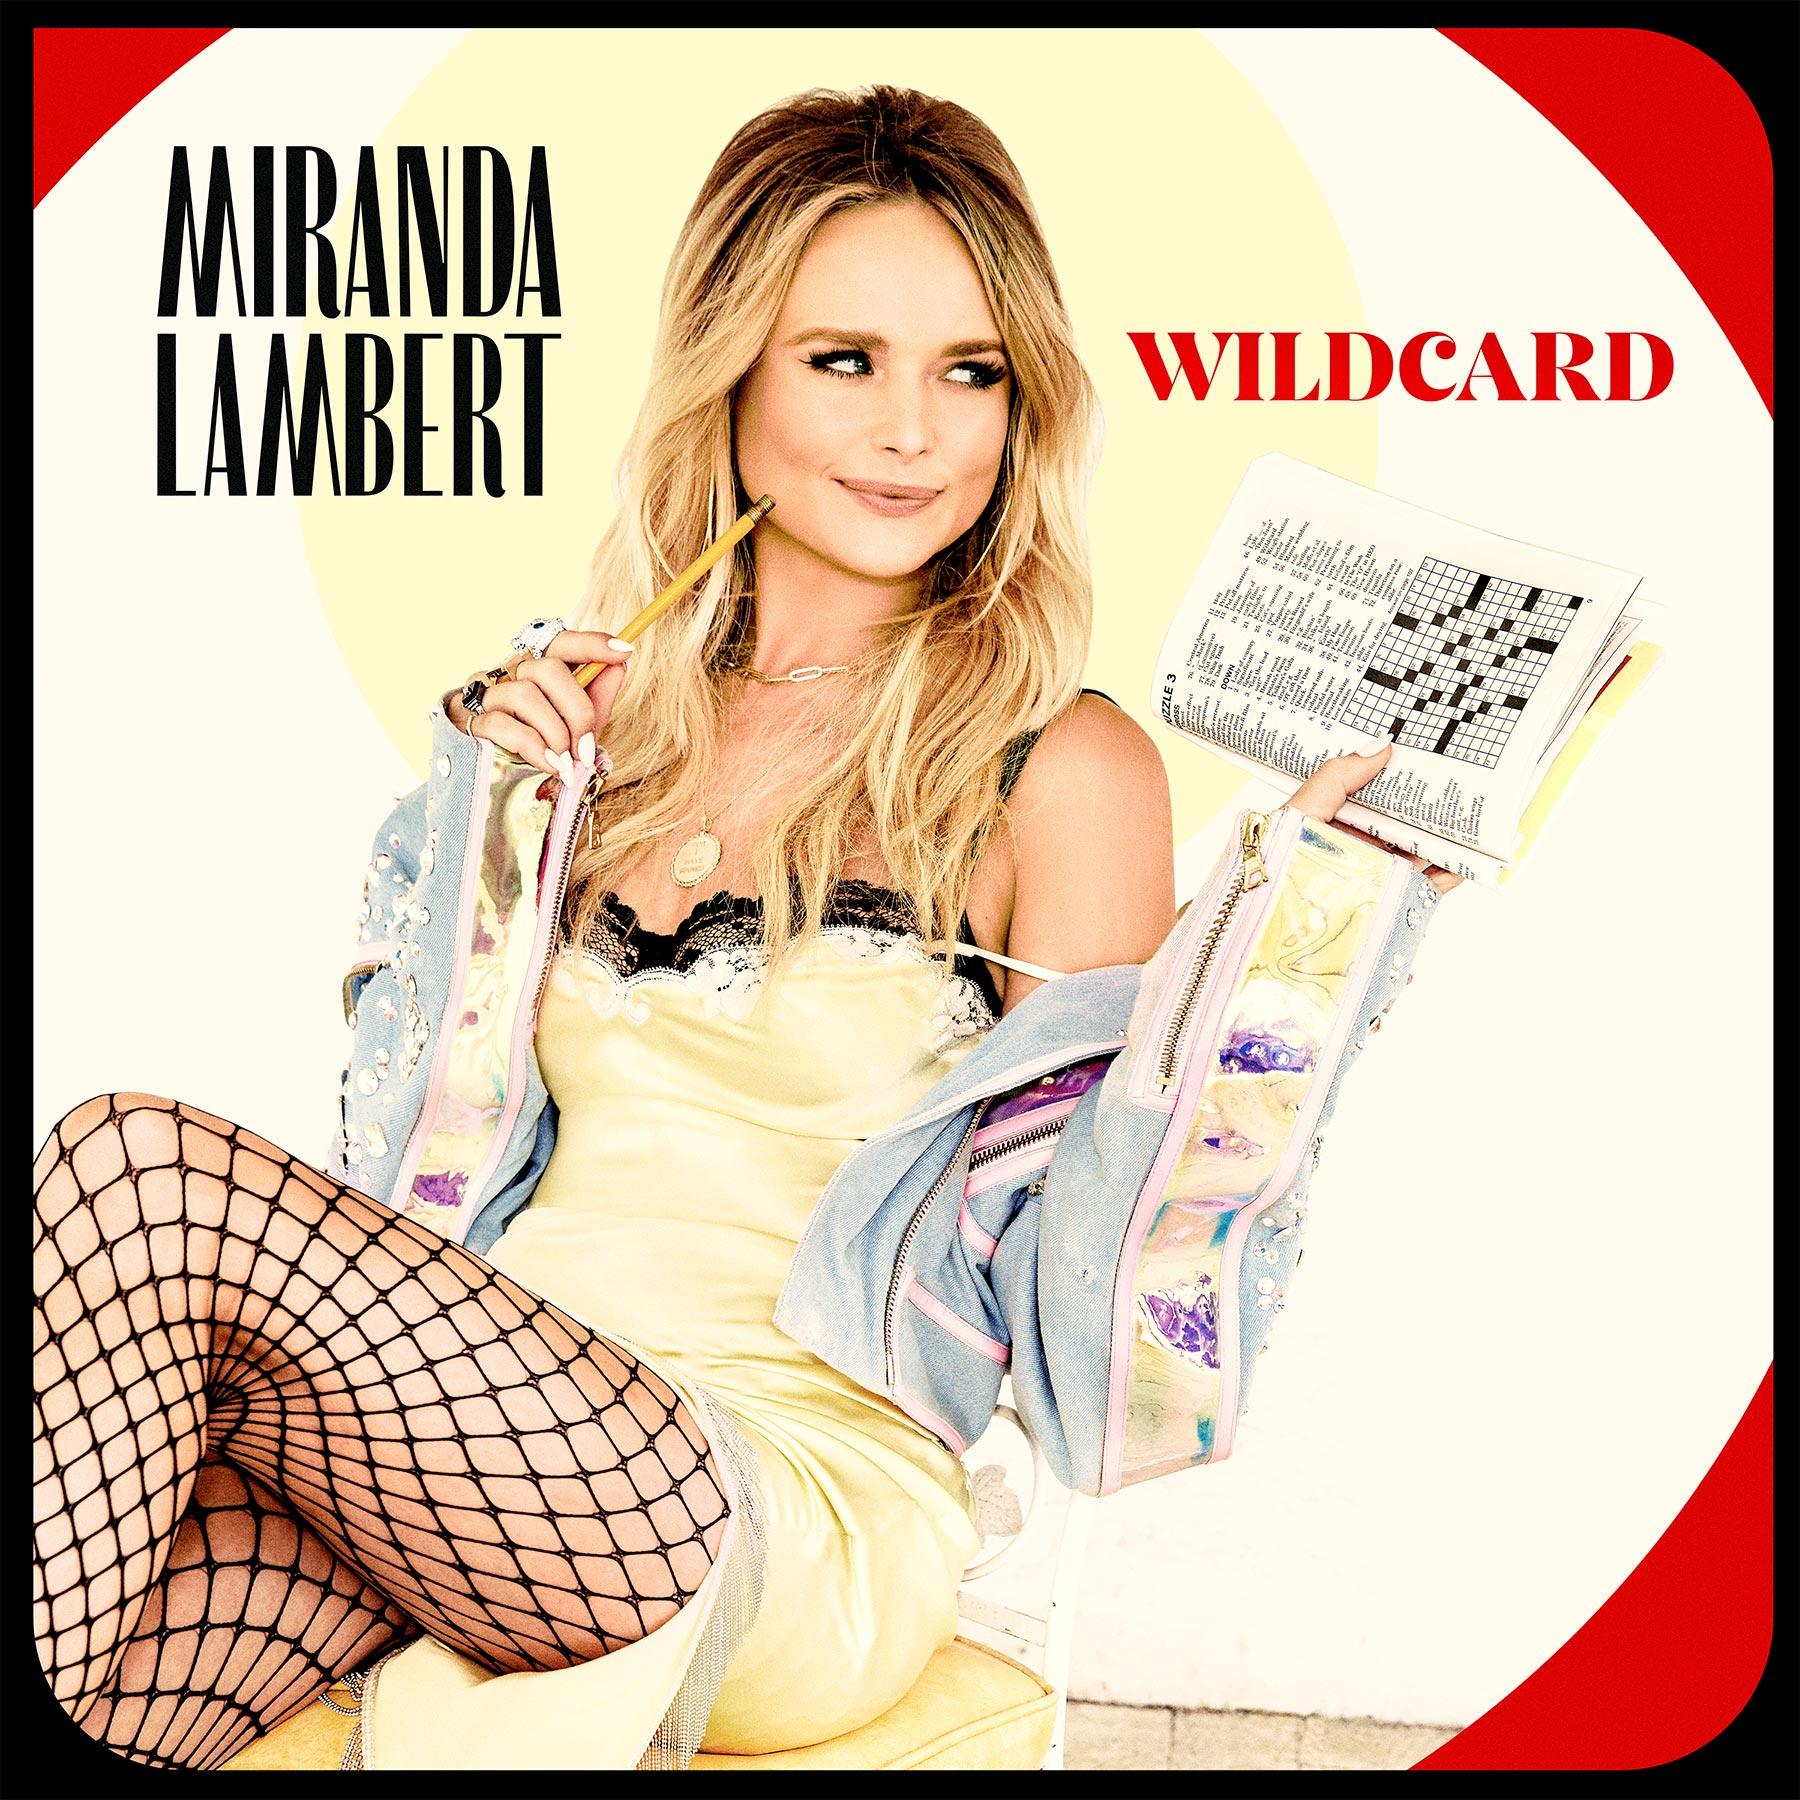 Miranda Lambert 'Wildcard' album cover